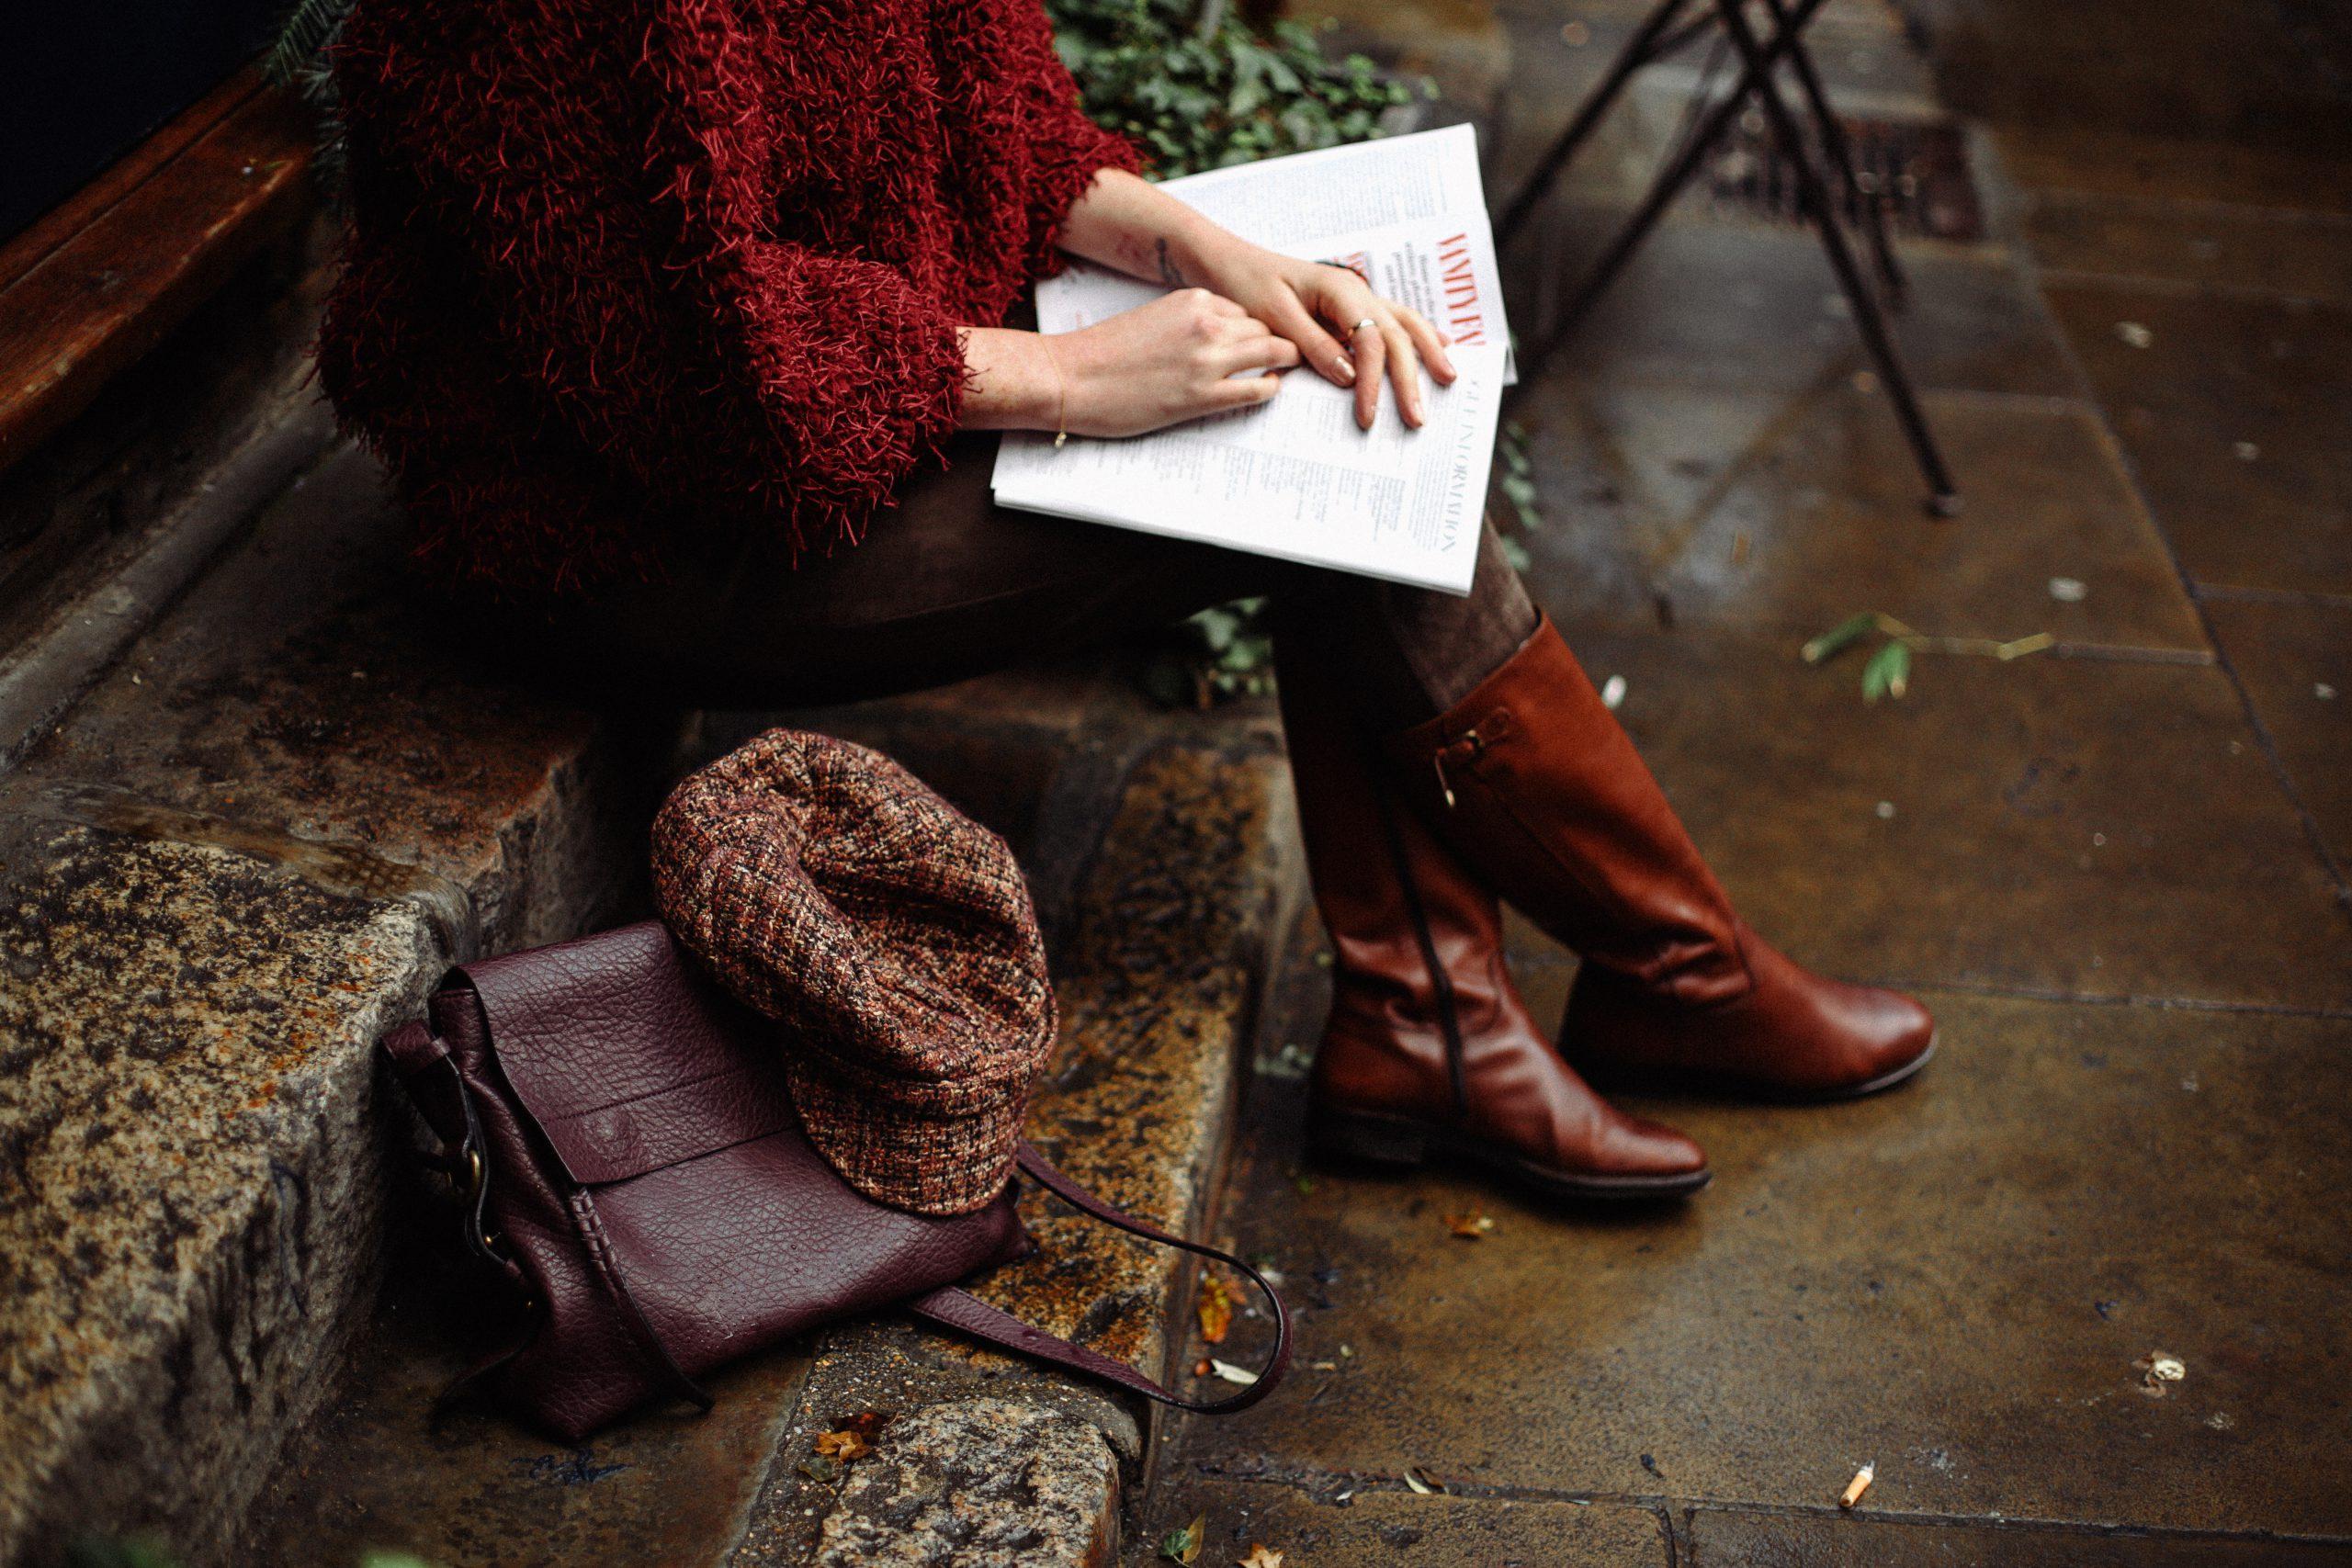 Elegancka garderoba na sezon jesienno-zimowy